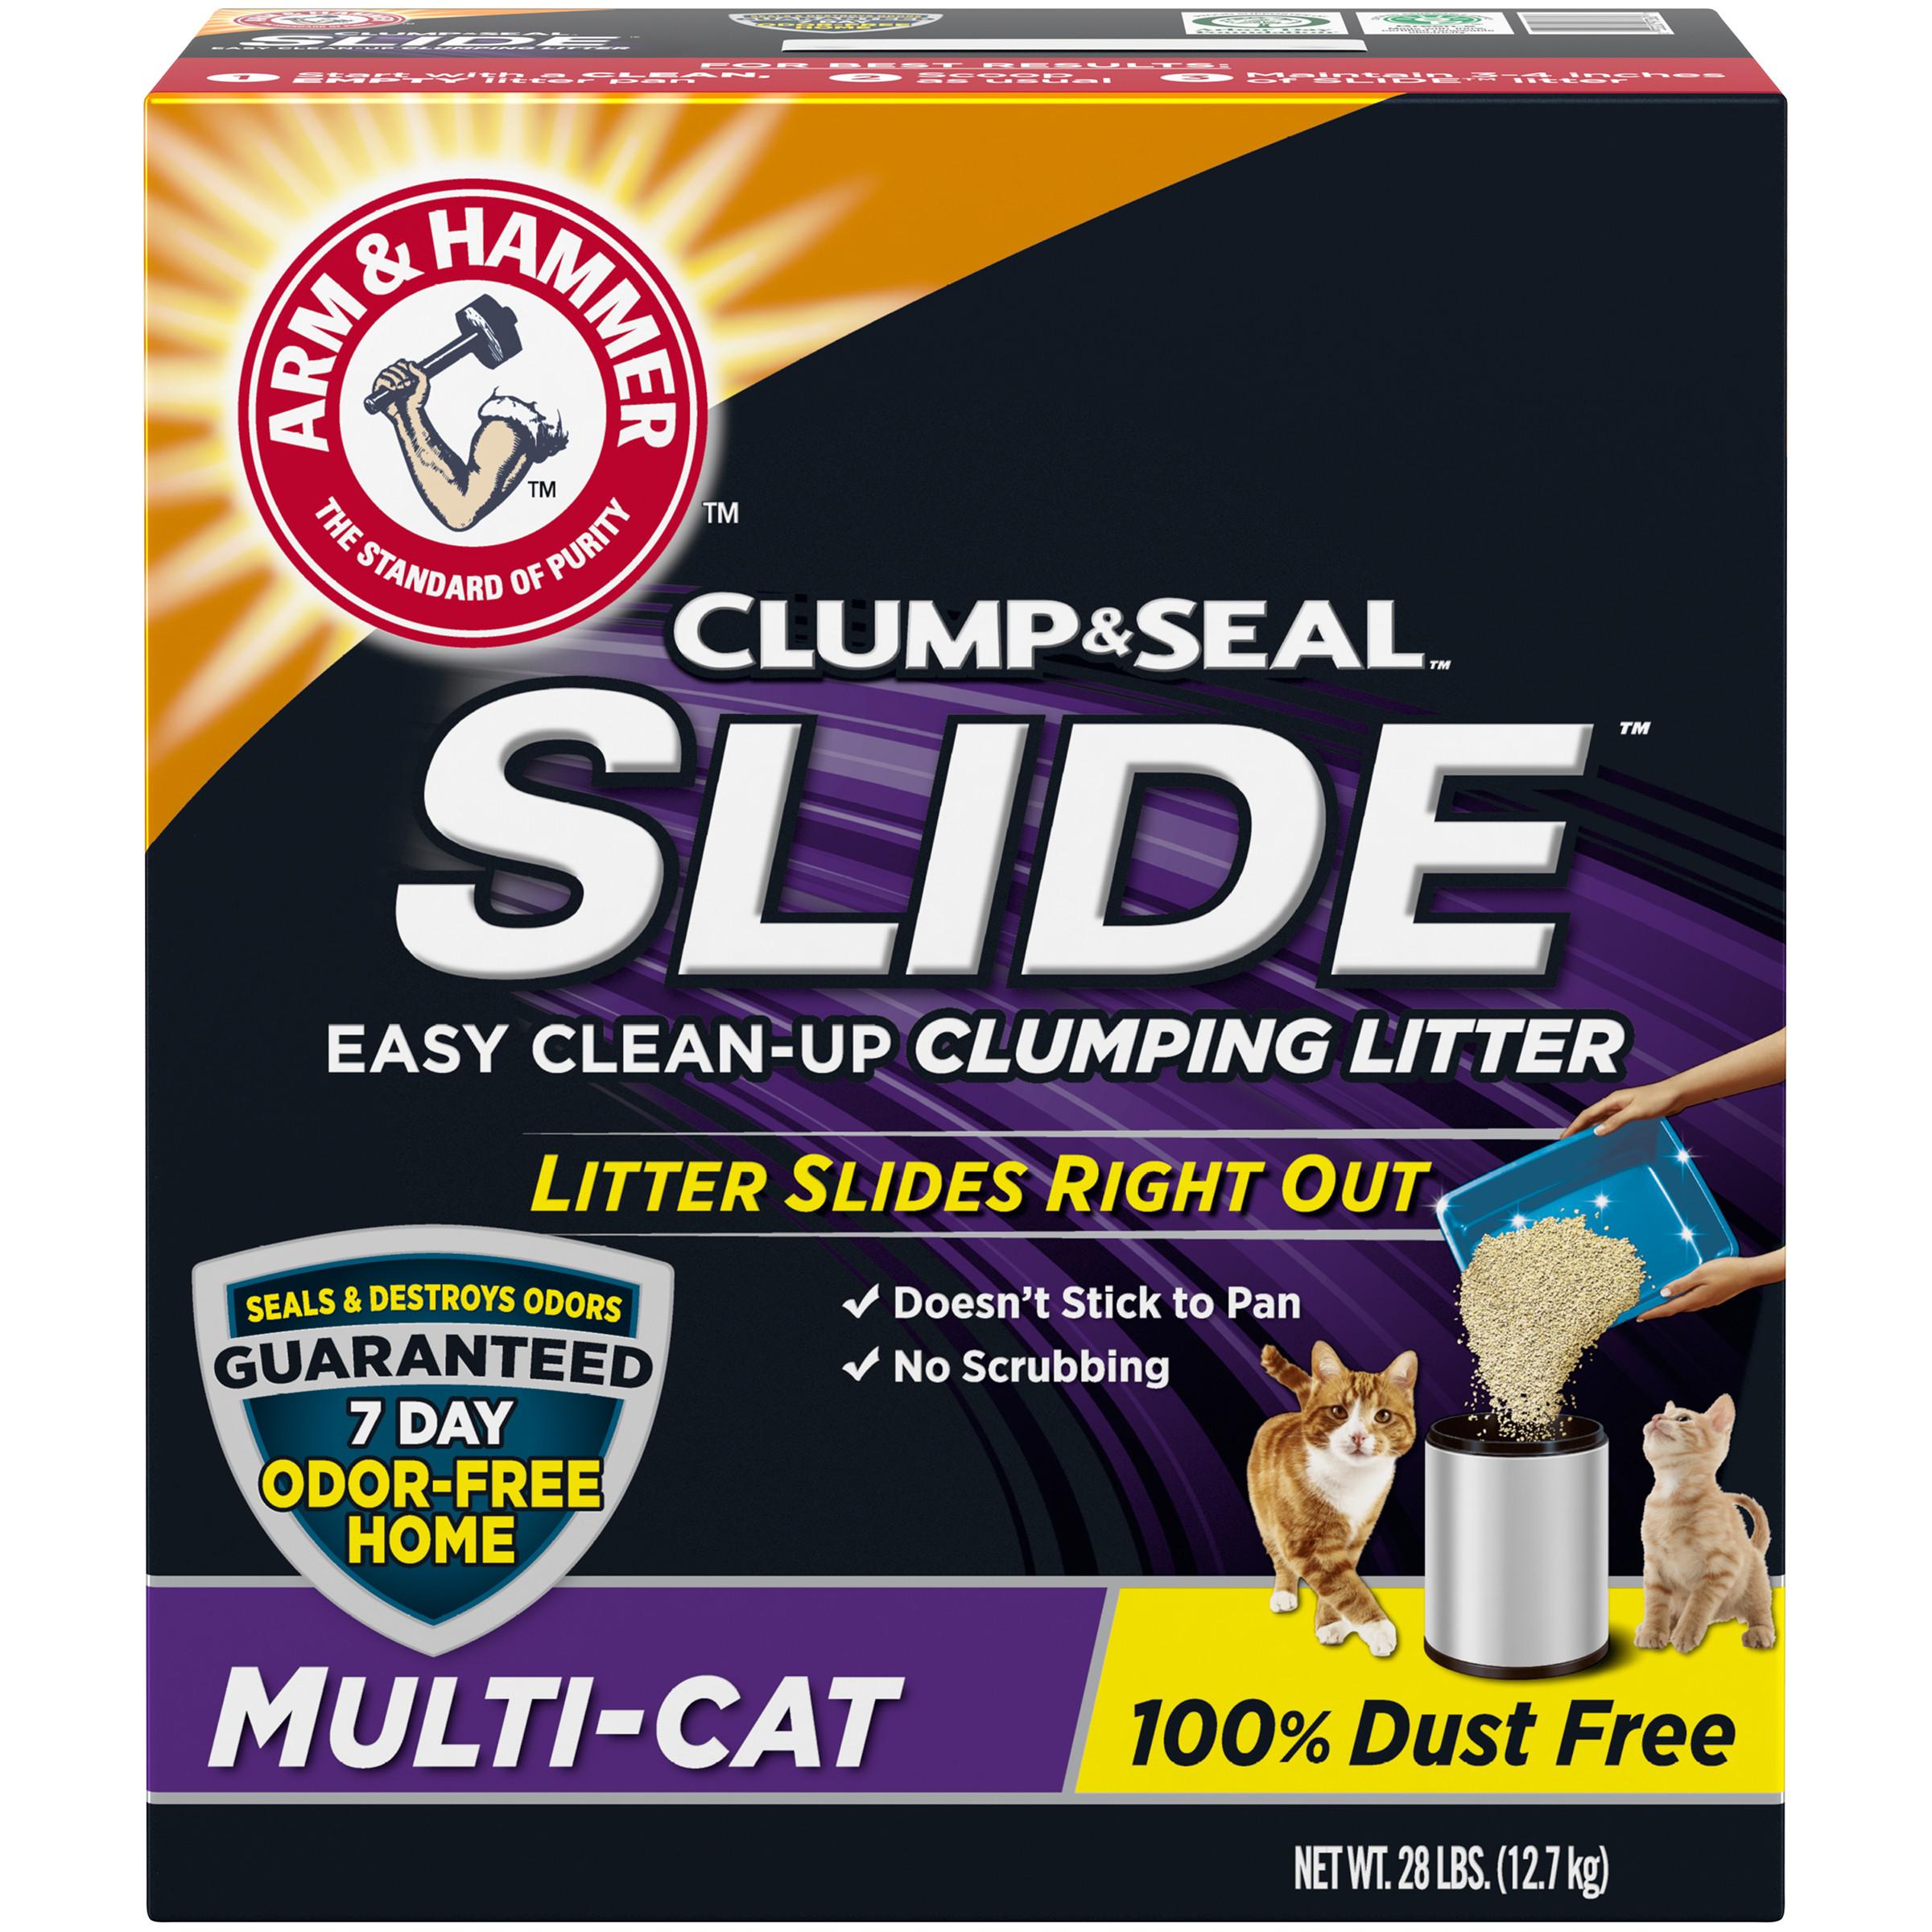 28-Lb Arm & Hammer SLIDE Easy Clean-Up Litter (Multi-Cat) $8.47 + Free Store Pickup